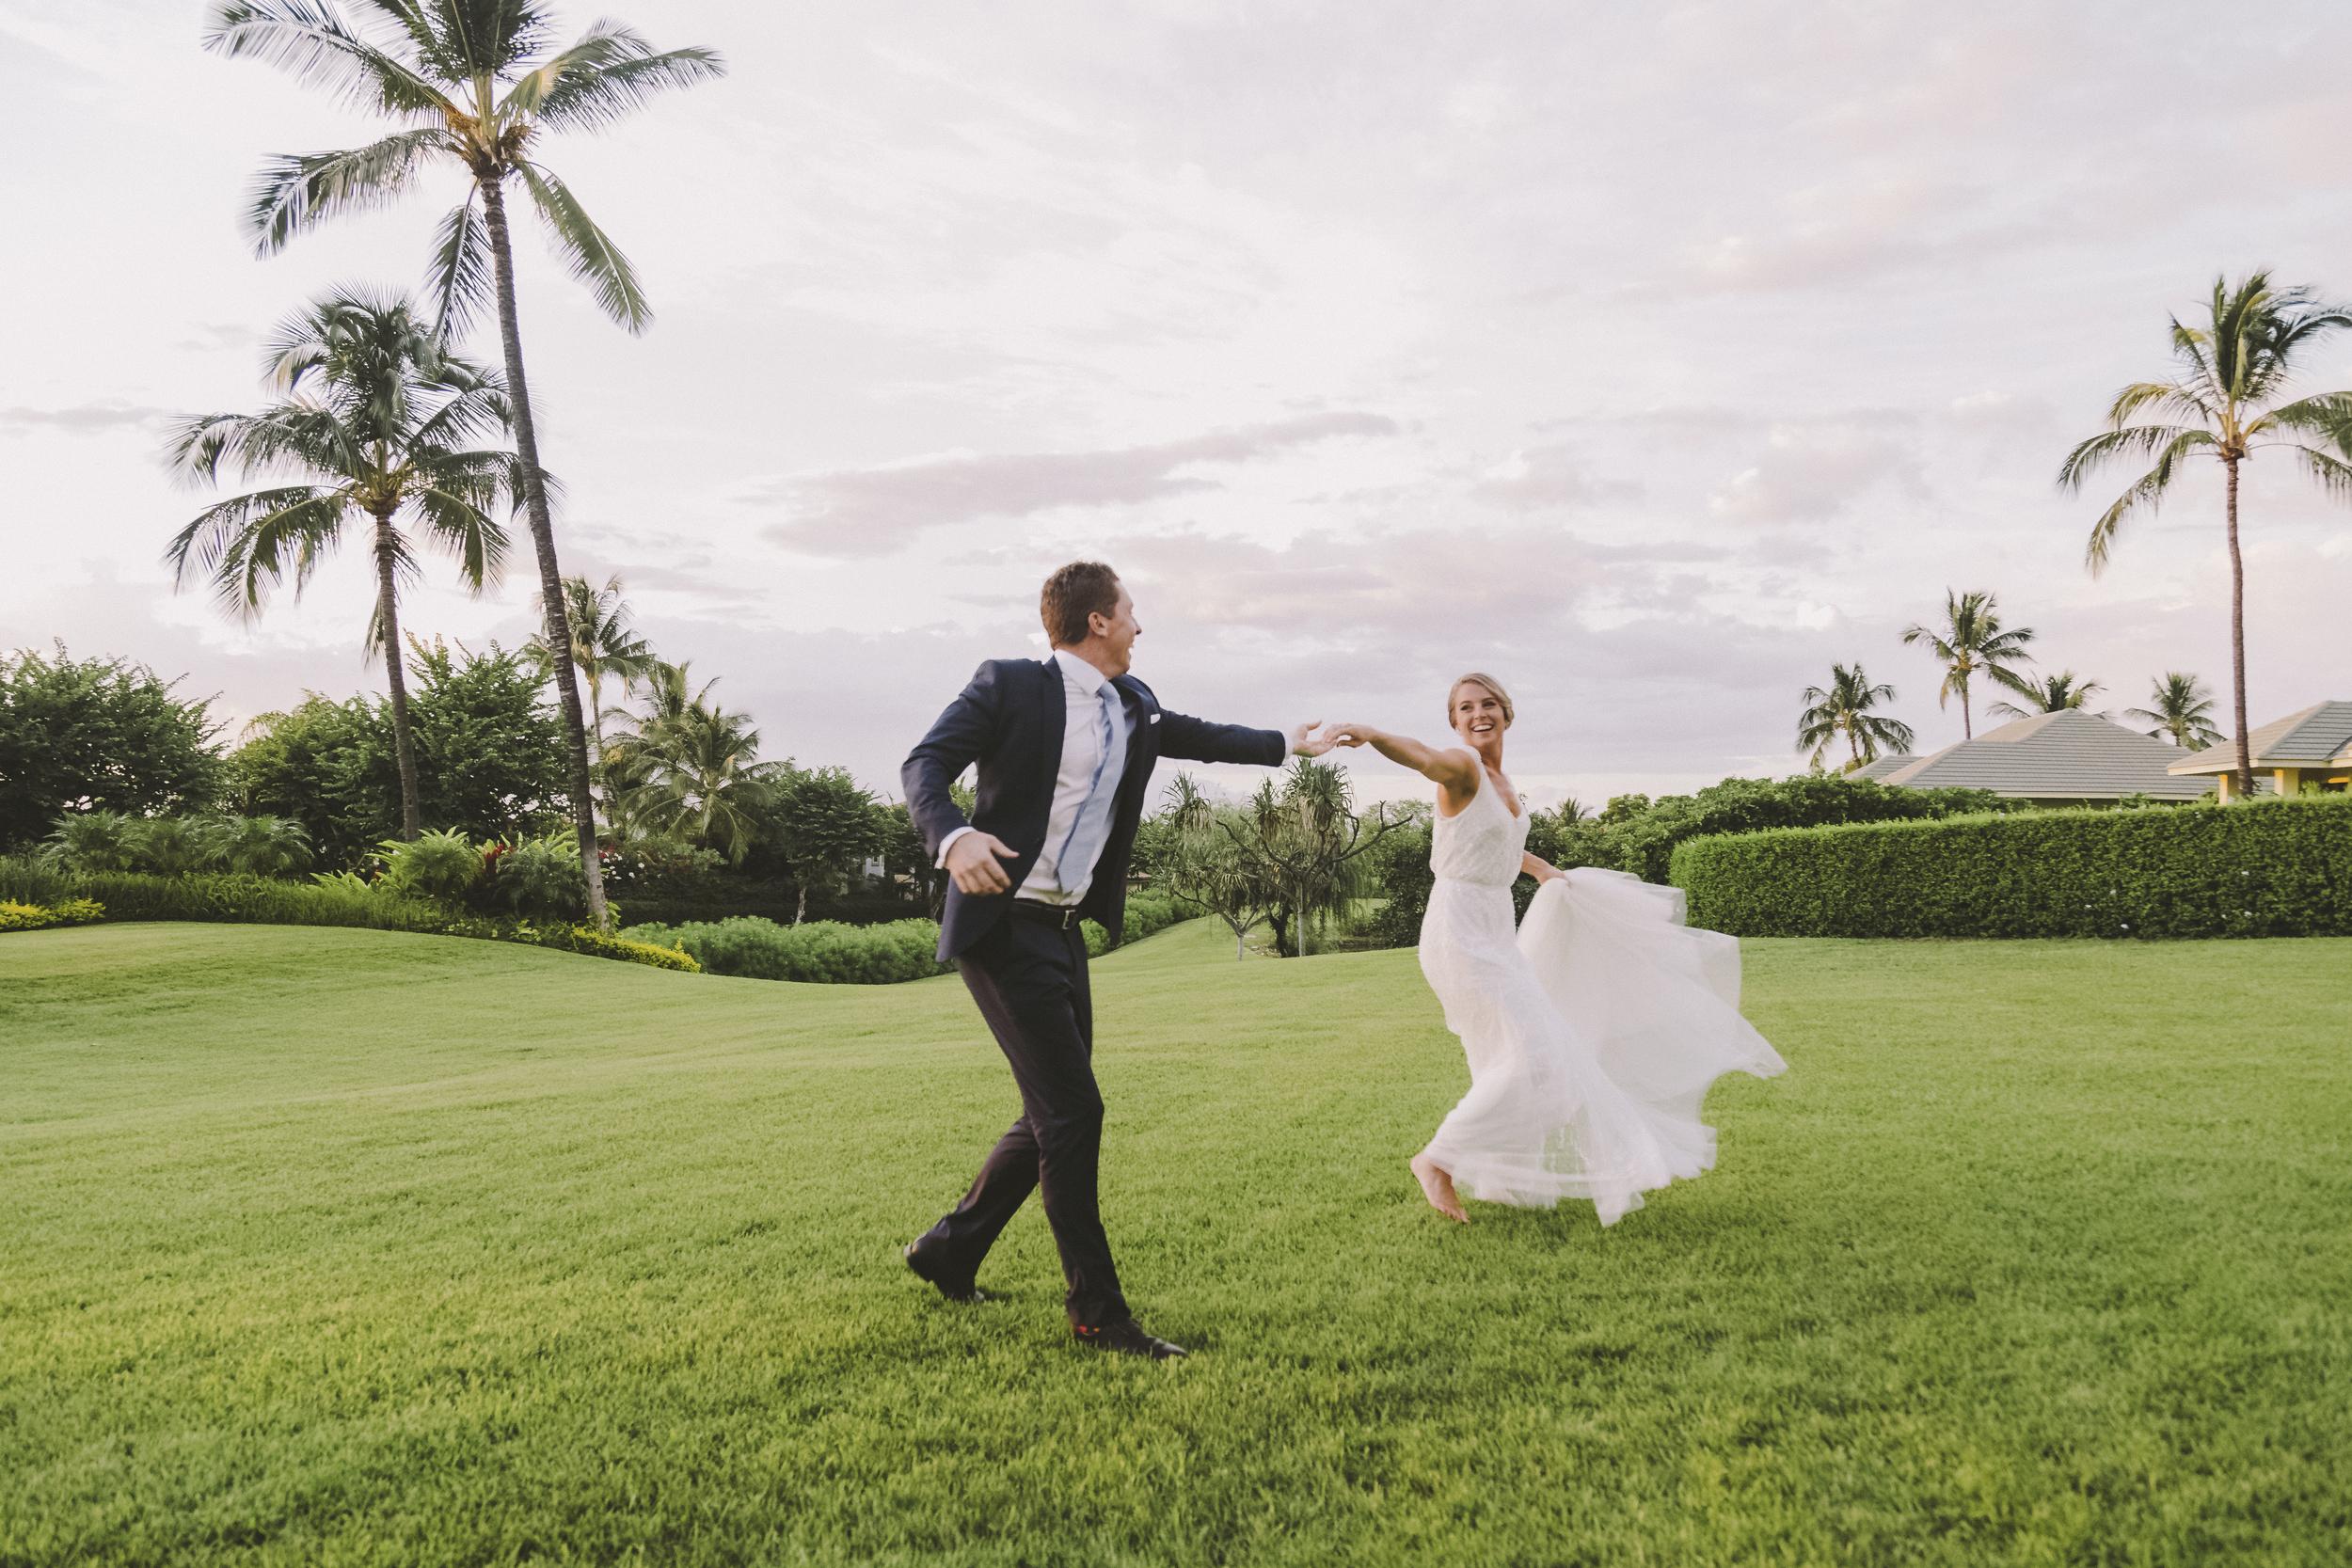 angie-diaz-photography-maui-wedding-mel-matt-93.jpg